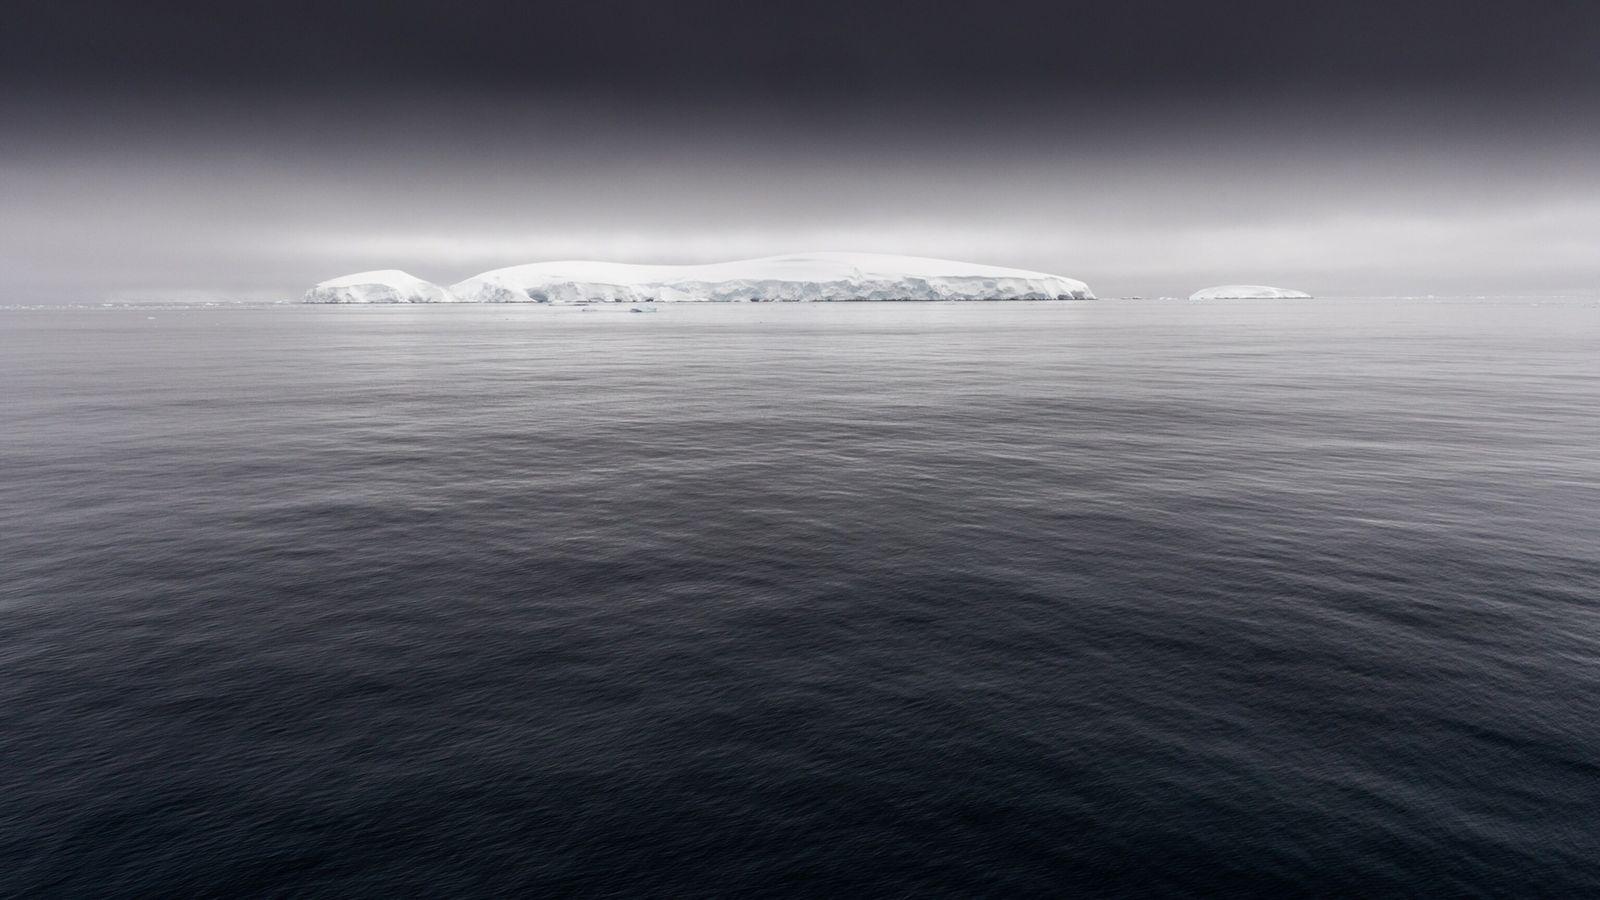 Quinto oceano